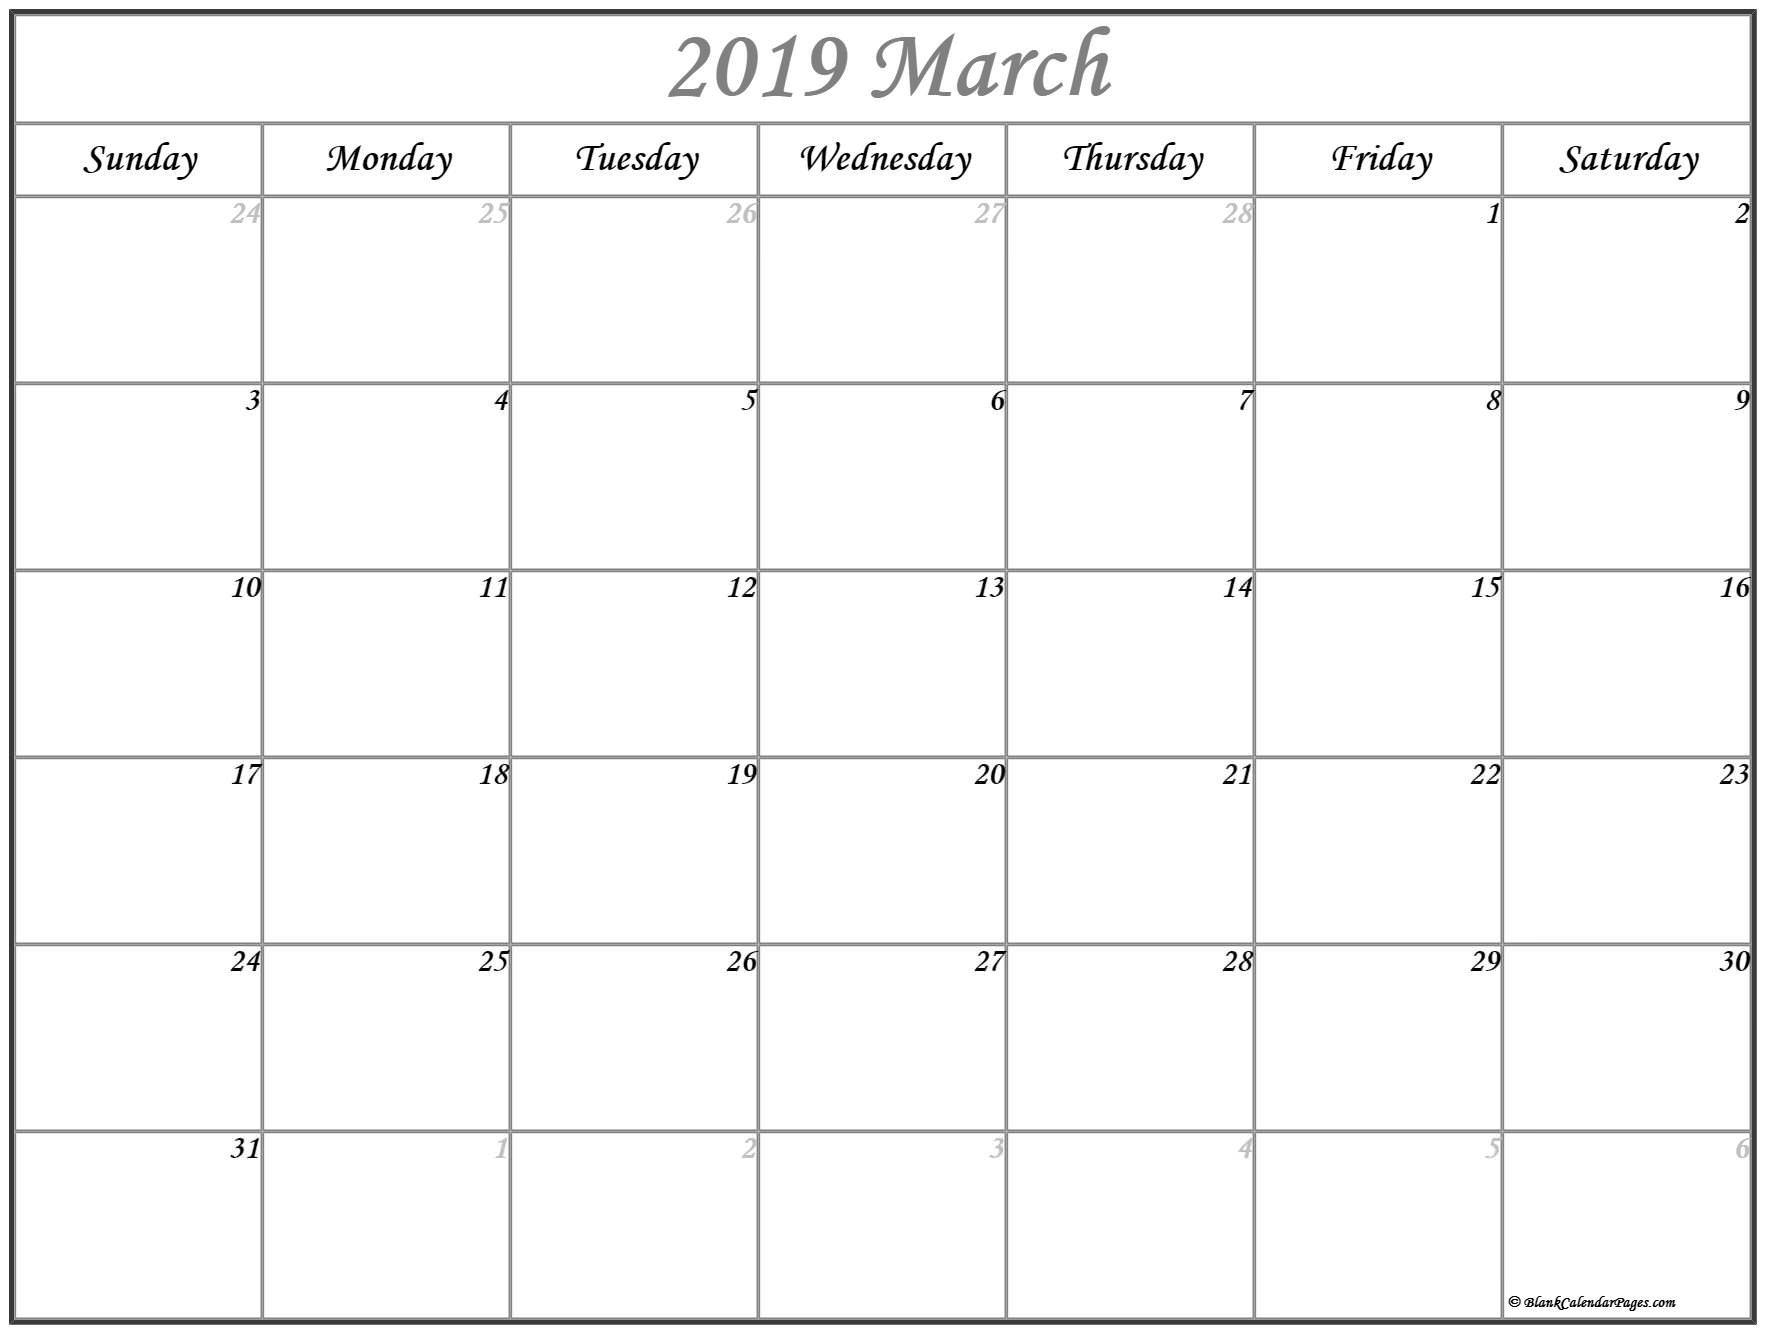 March 2019 Calendar   56+ Templates Of 2019 Printable Calendars Calendar 2019 Agenda